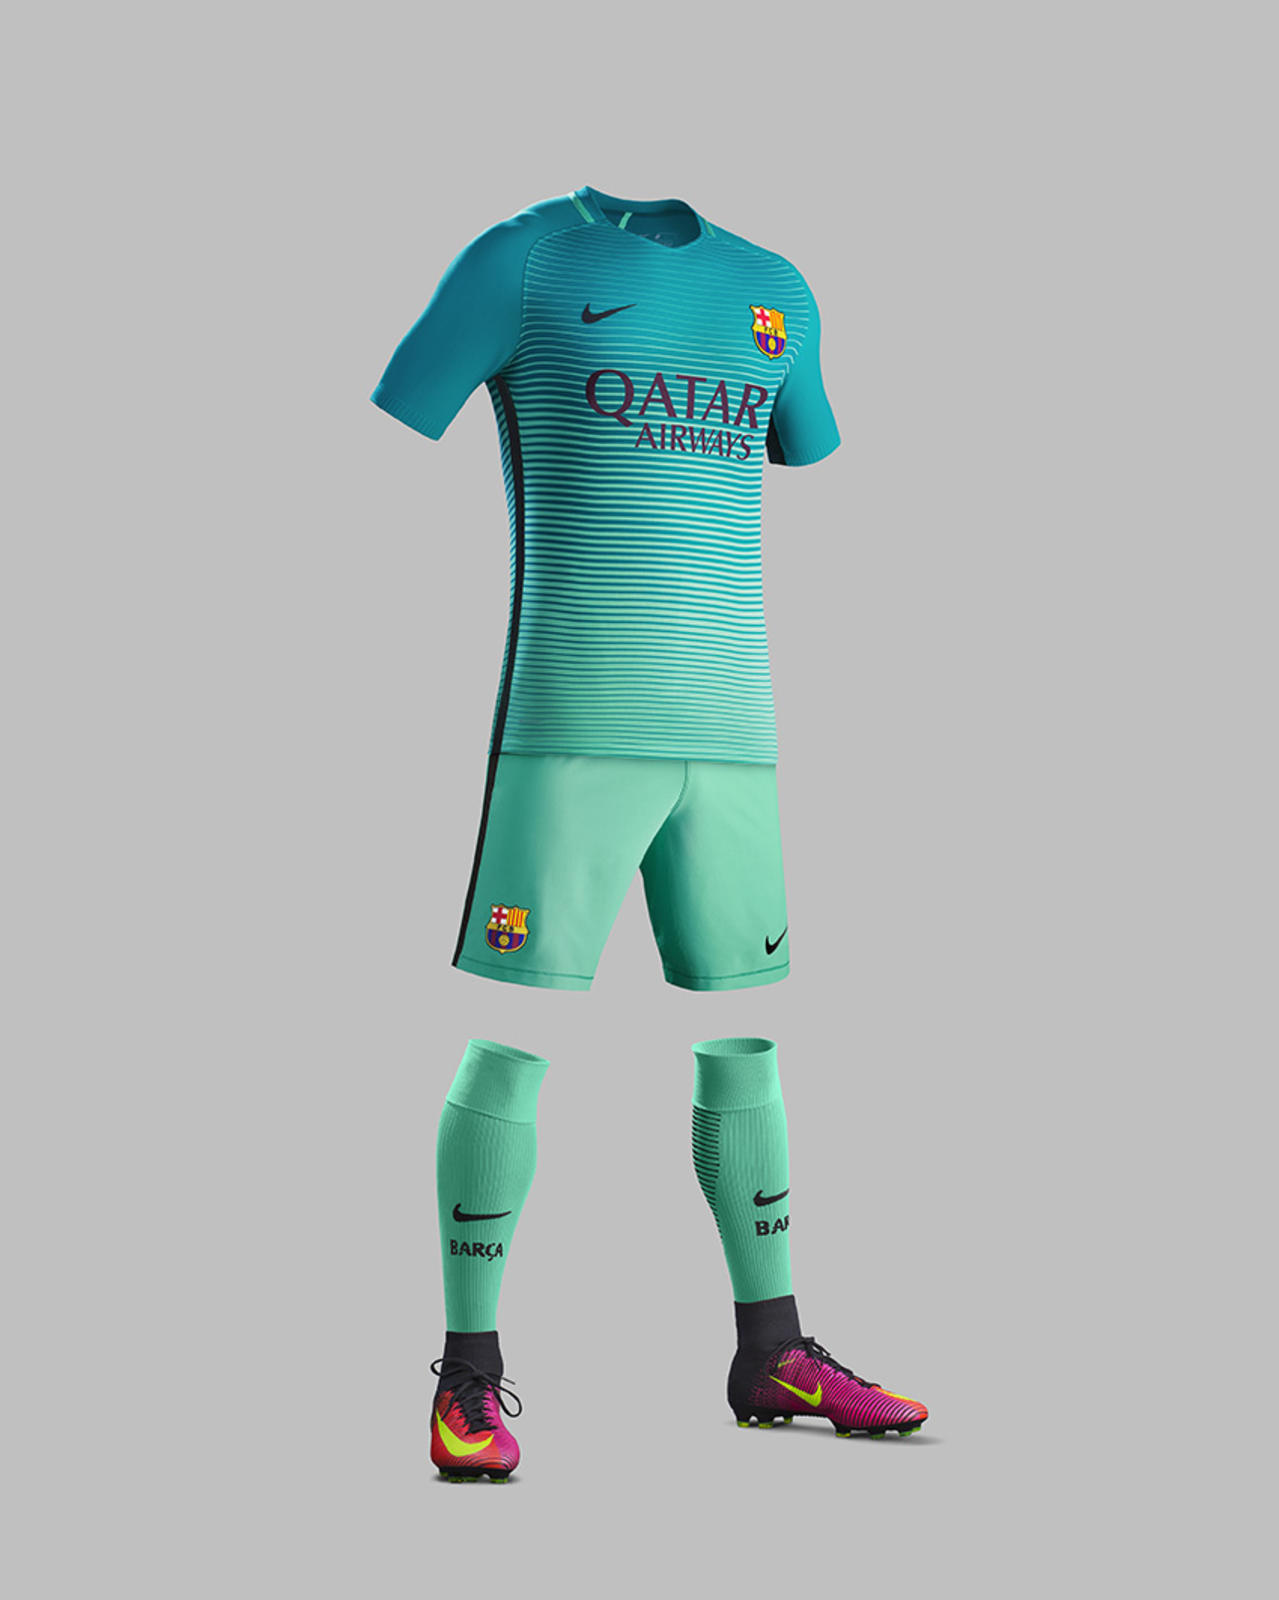 Barca camiseta 3. Champions League 2017